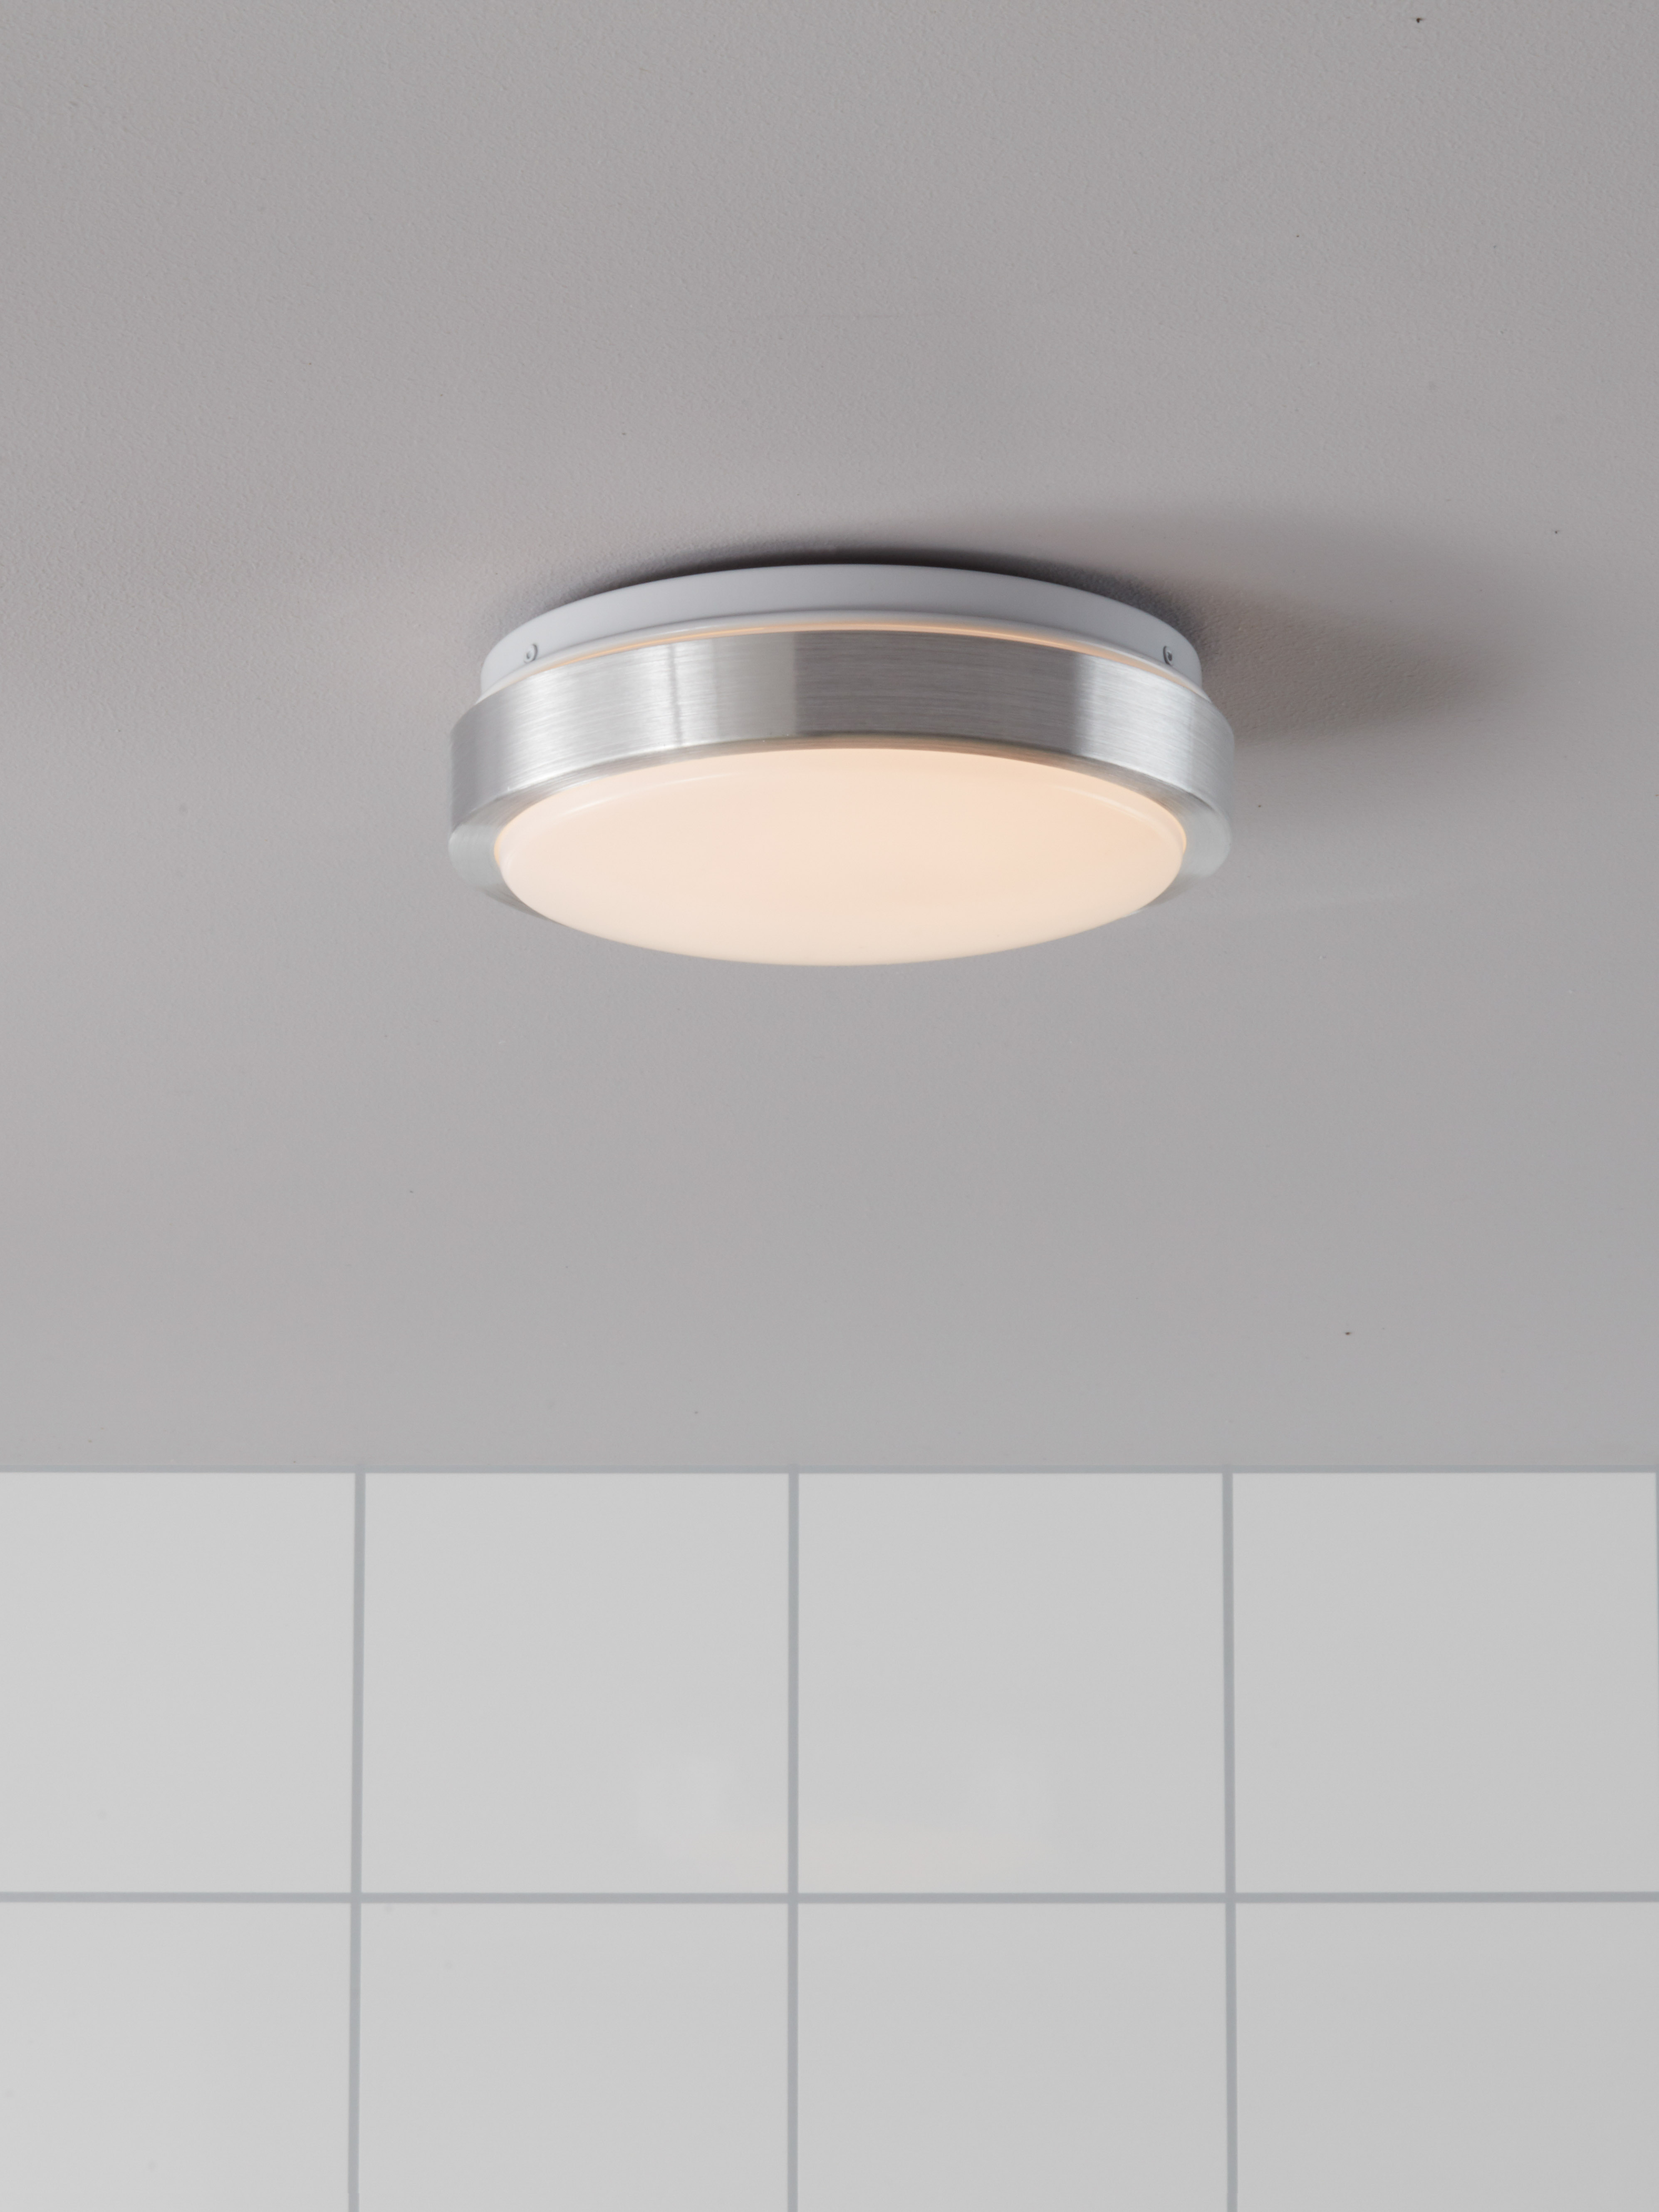 MOON - Plafond Bathroom 22